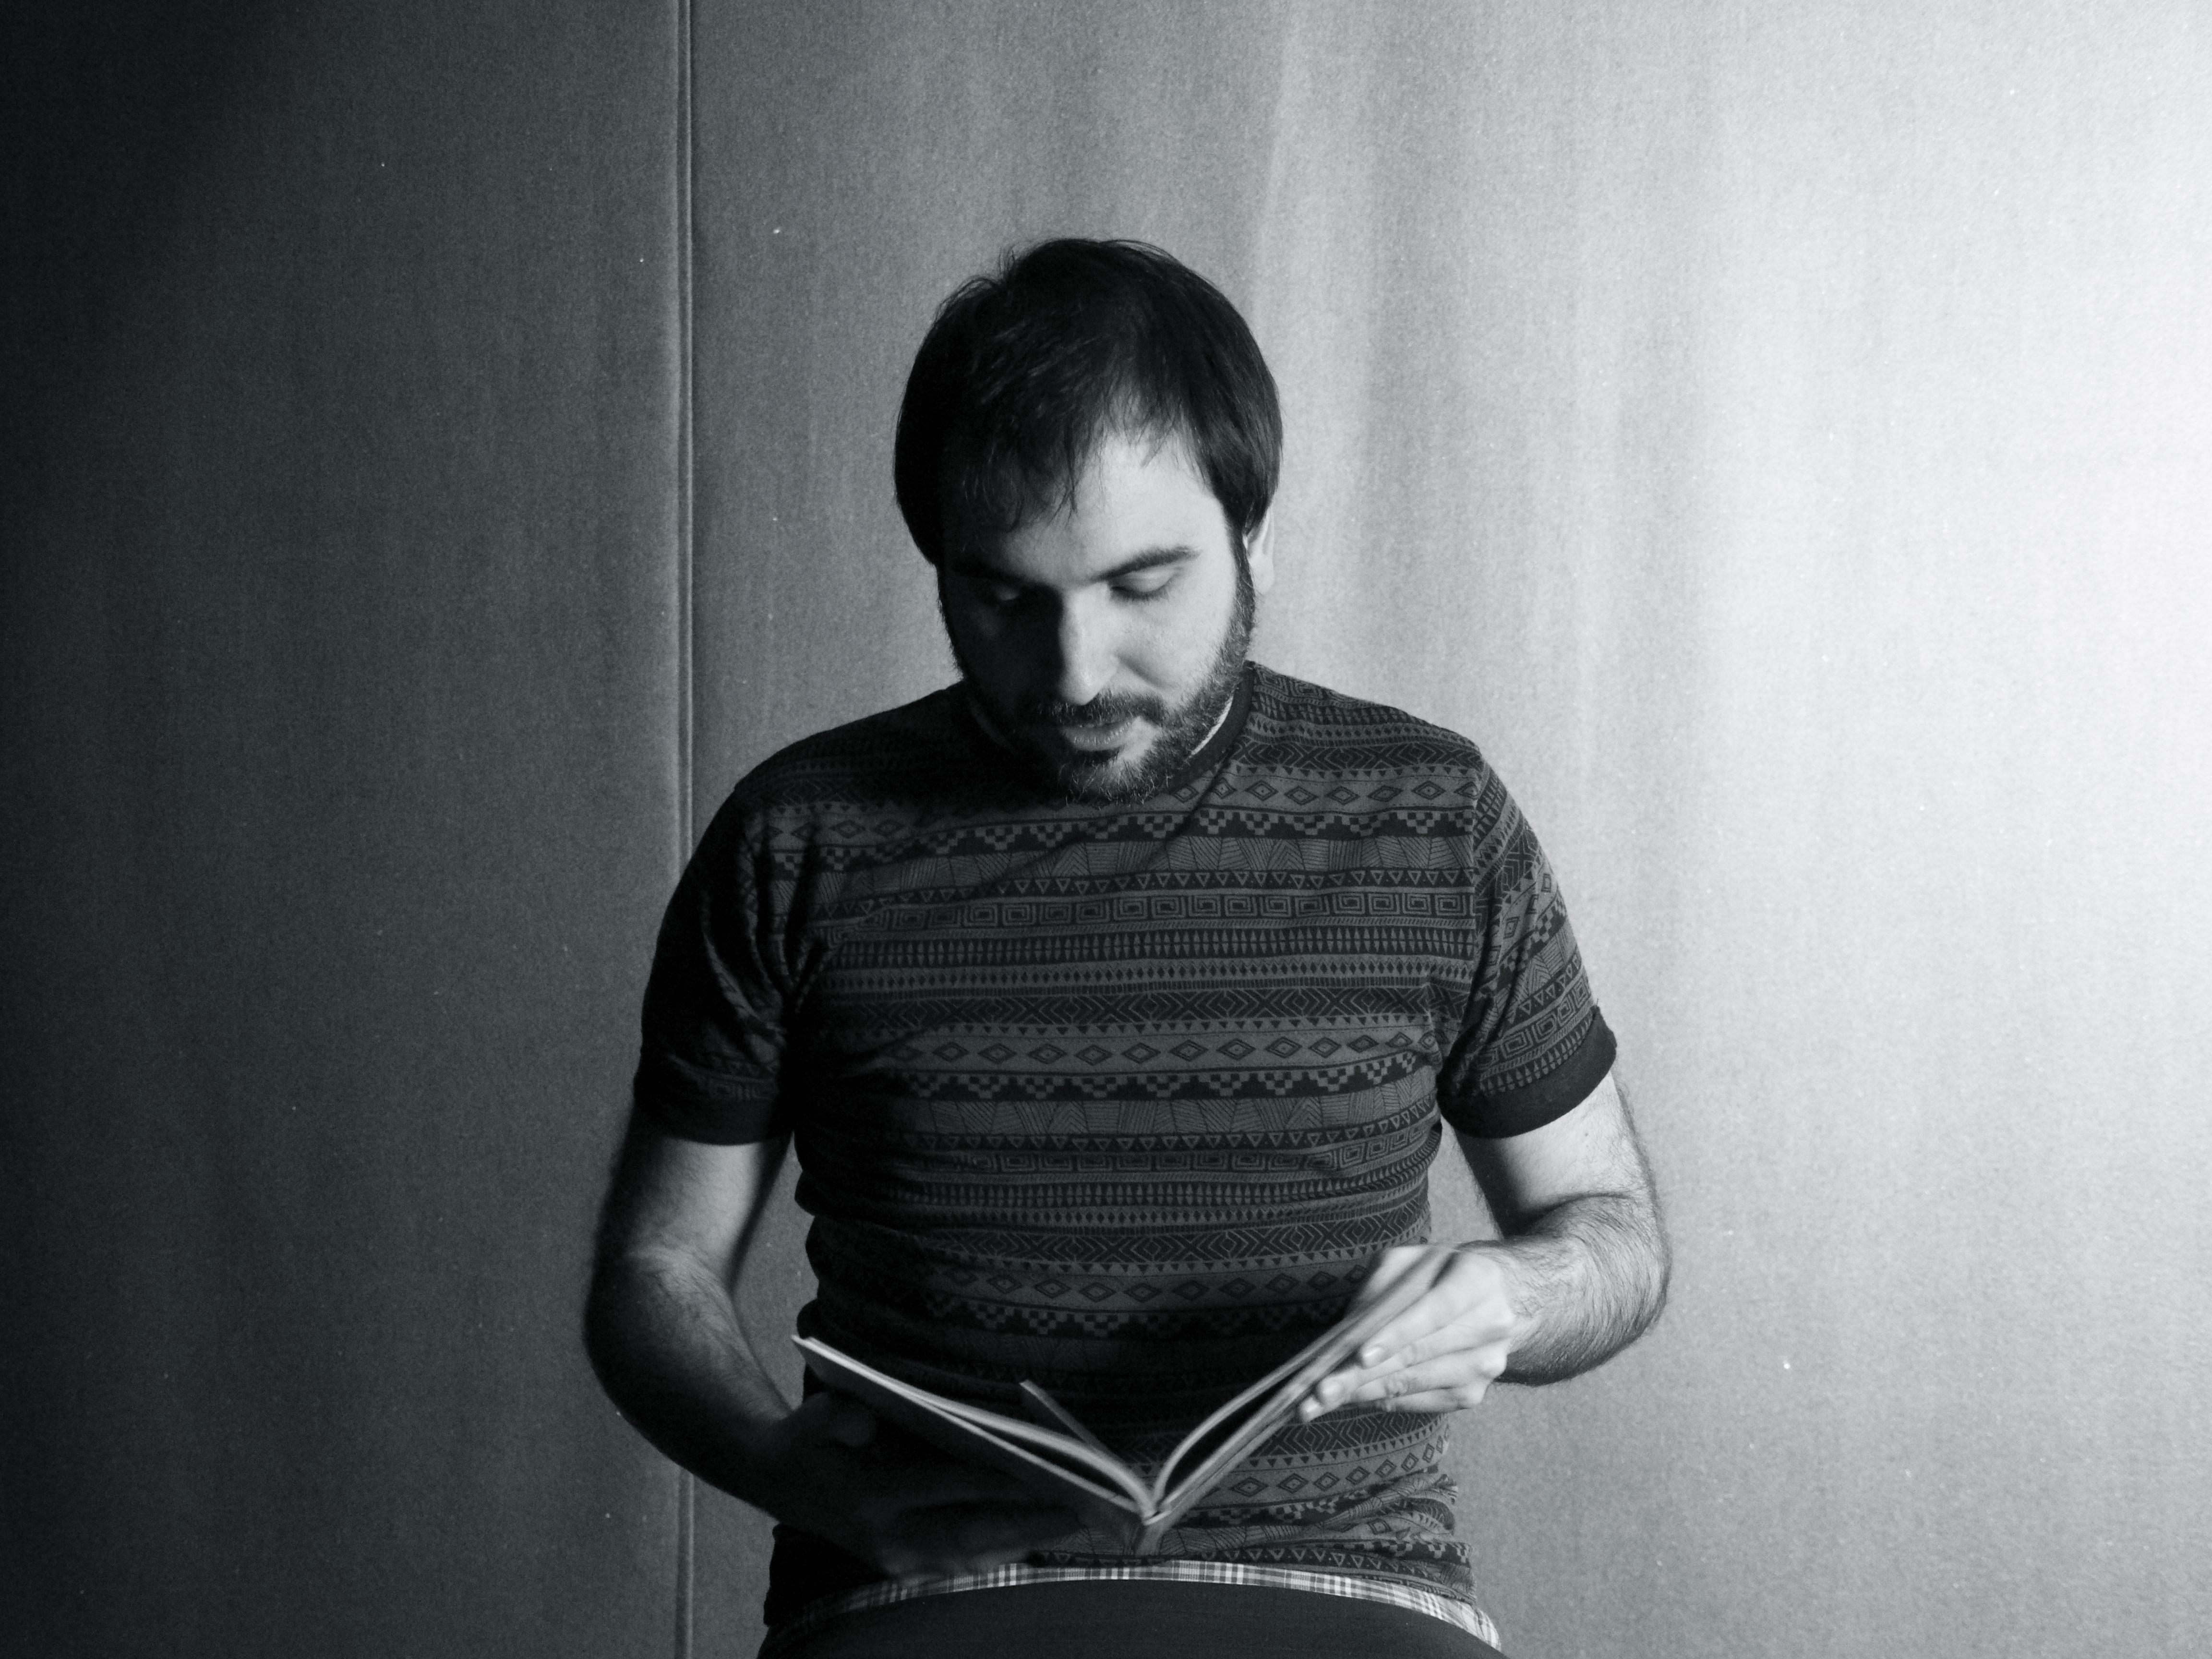 Book_2_David_Pallás_Gozalo_Geométrico_5